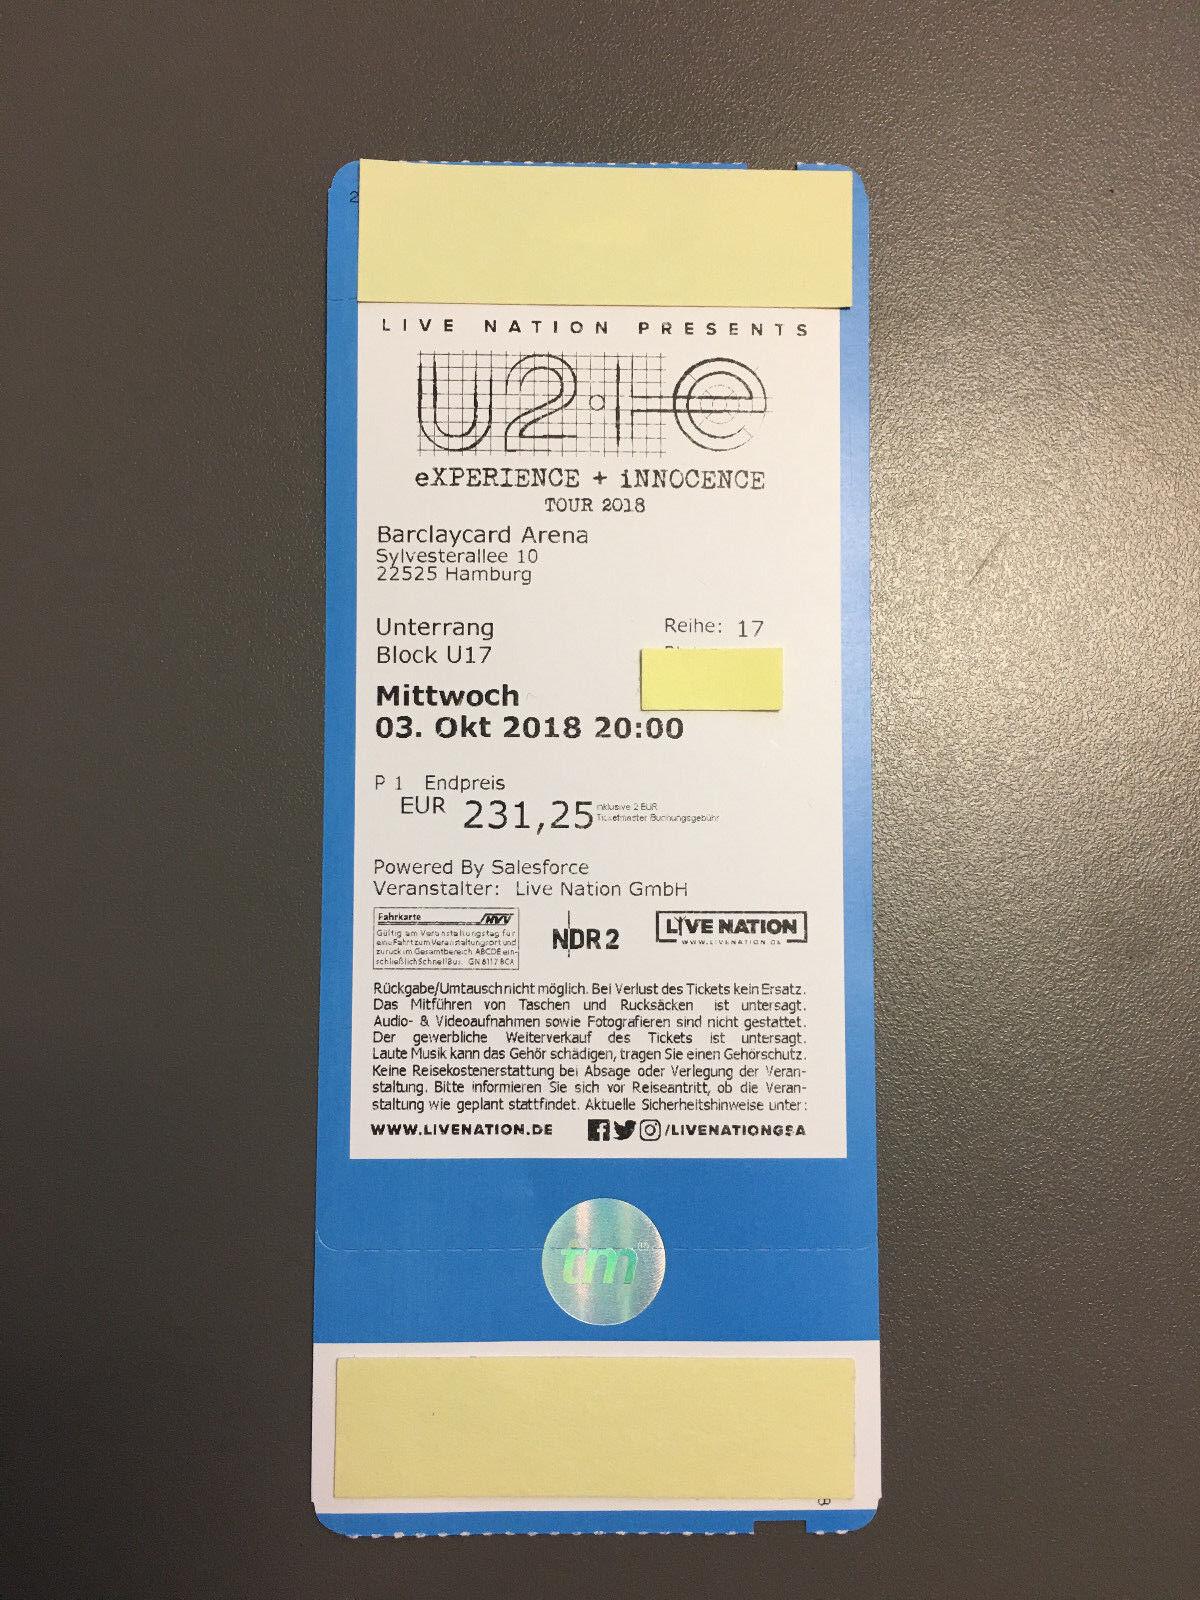 U2 Hamburg - 3.10.18 - Kategorie 1 - Unterrang U17 - TOP-Ticket